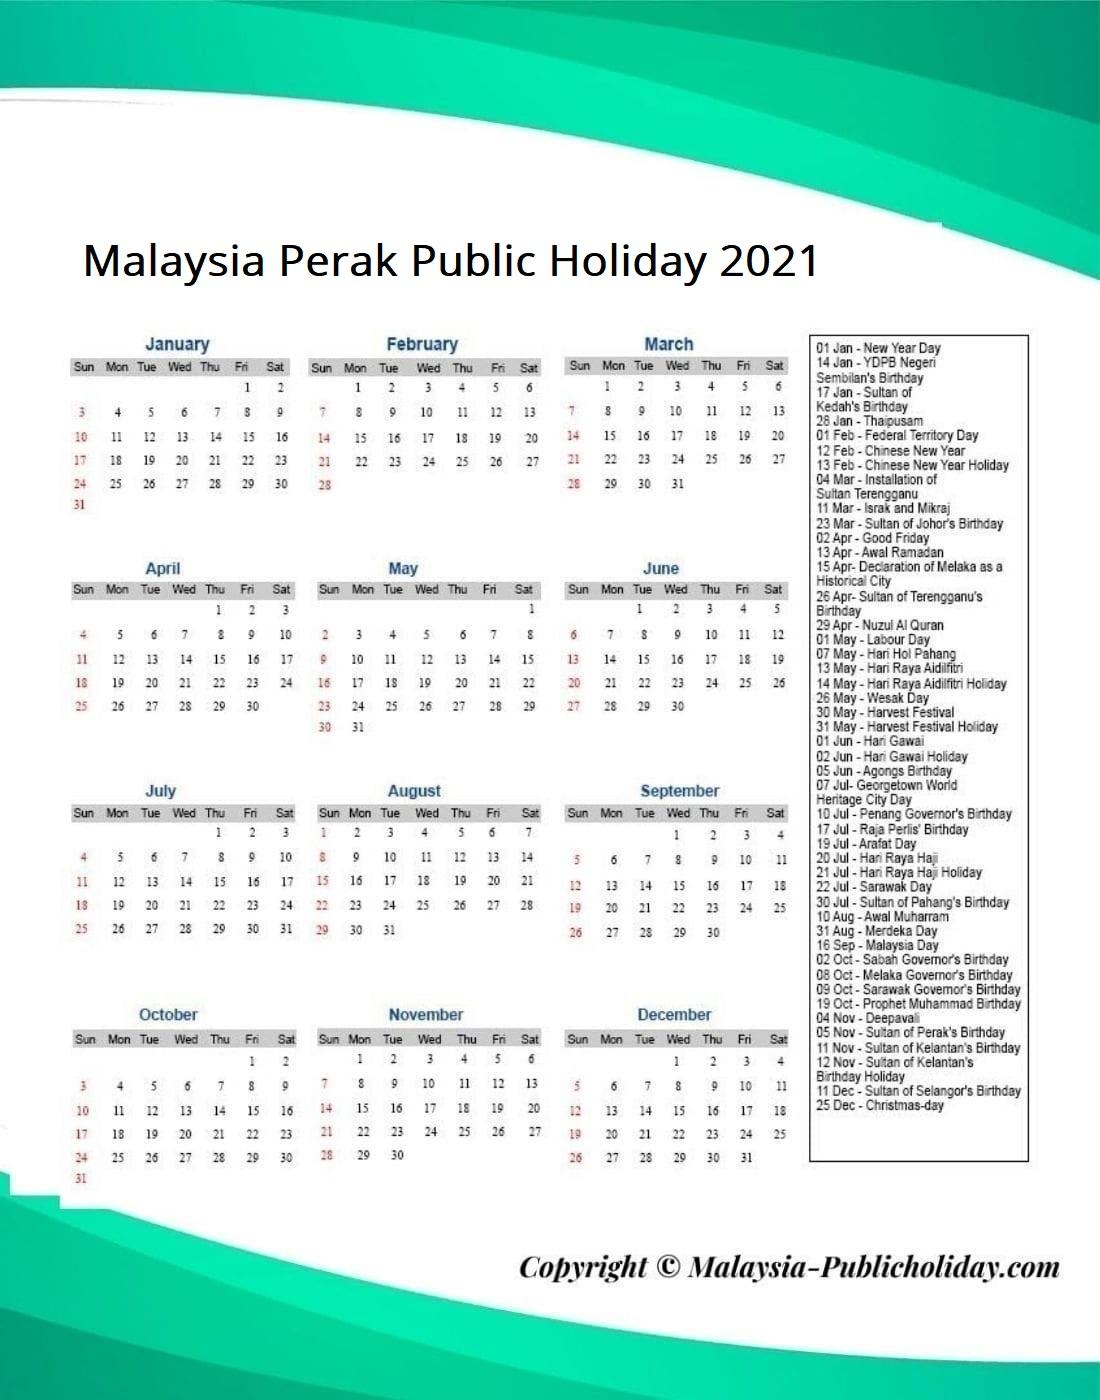 Perak Public Holiday 2021